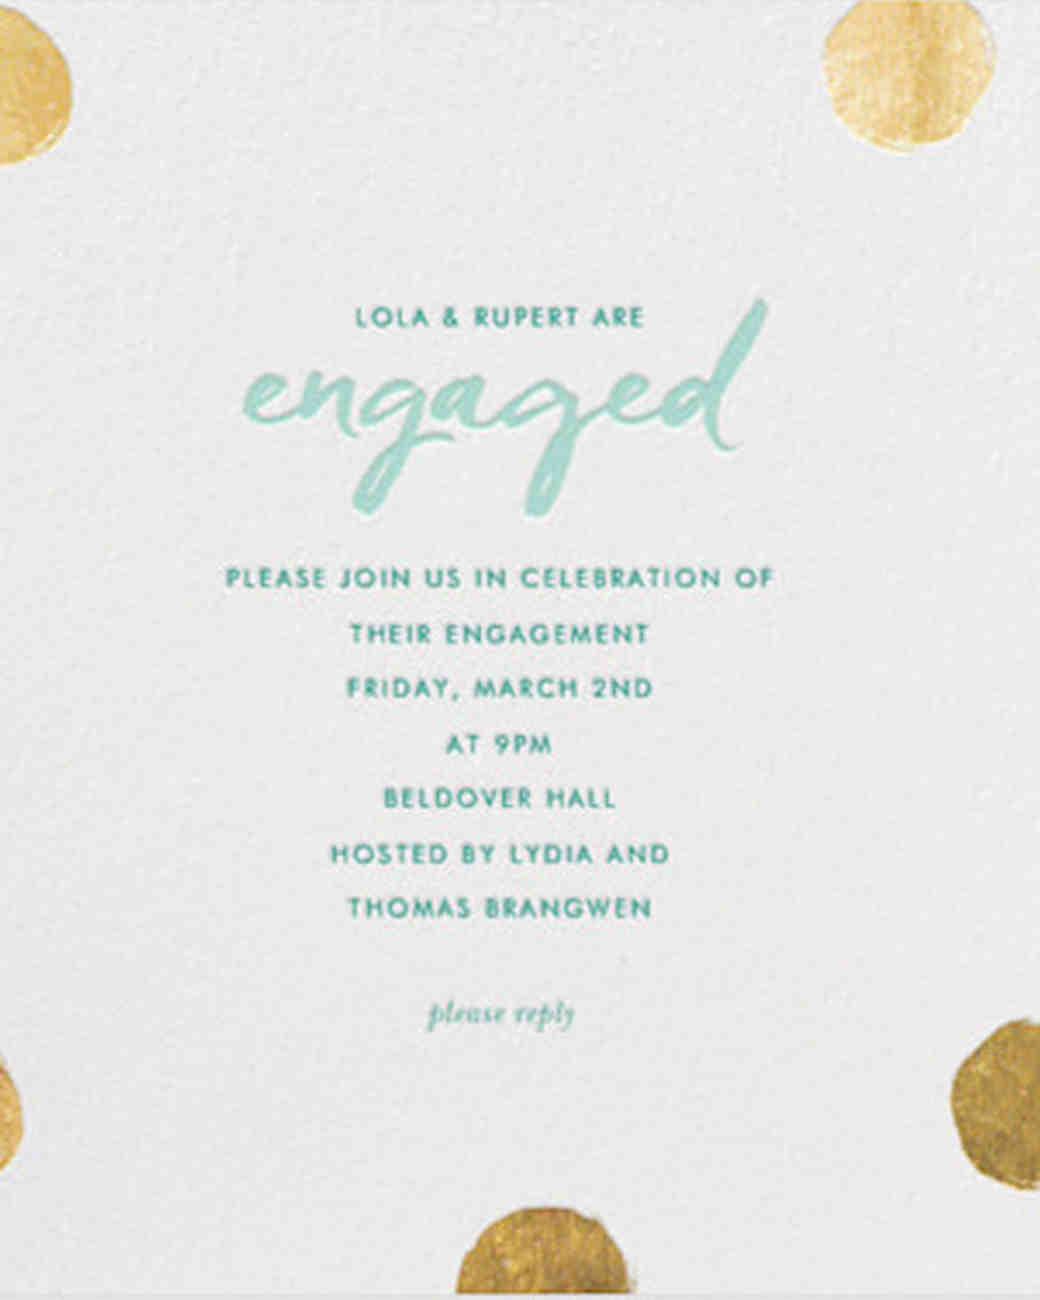 Gold Polka Dot Paperless Invitation  Free Engagement Party Invitation Templates Printable